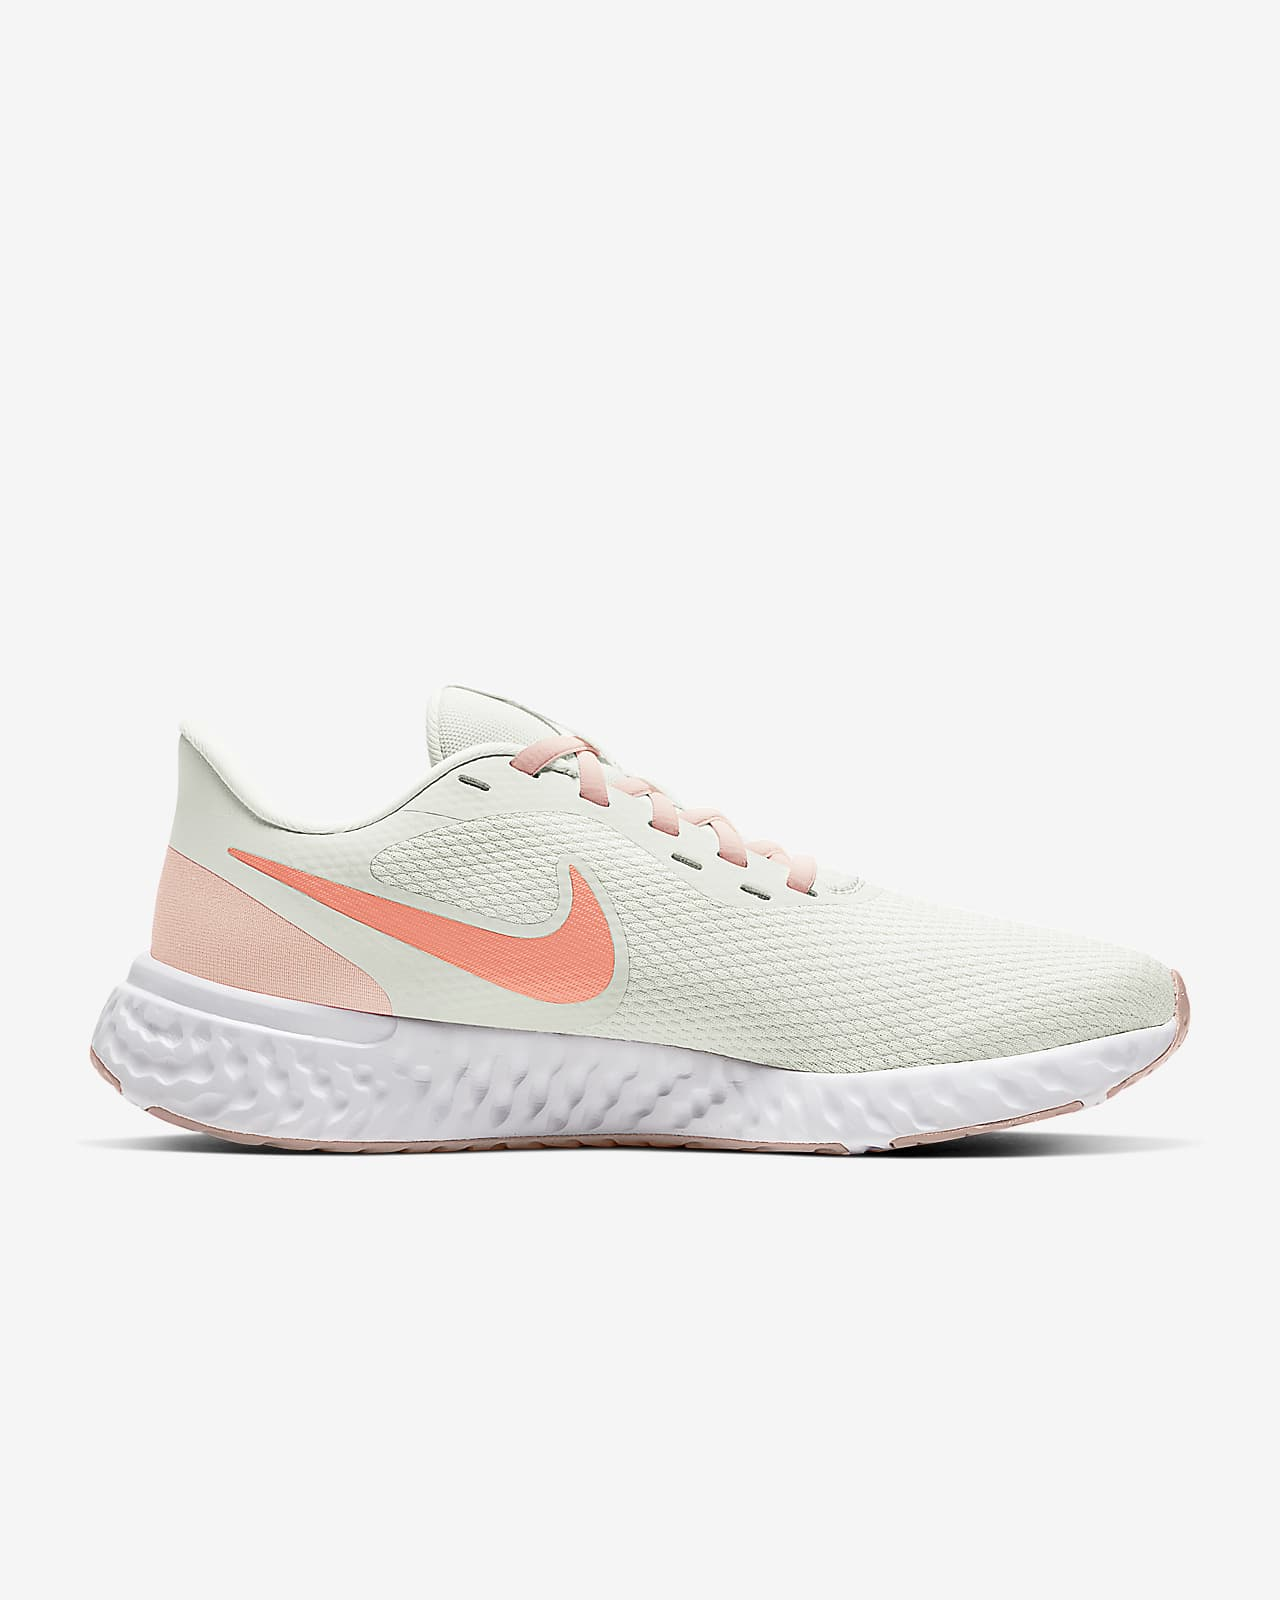 Chaussure de running Nike Revolution 5 pour Femme. Nike FR